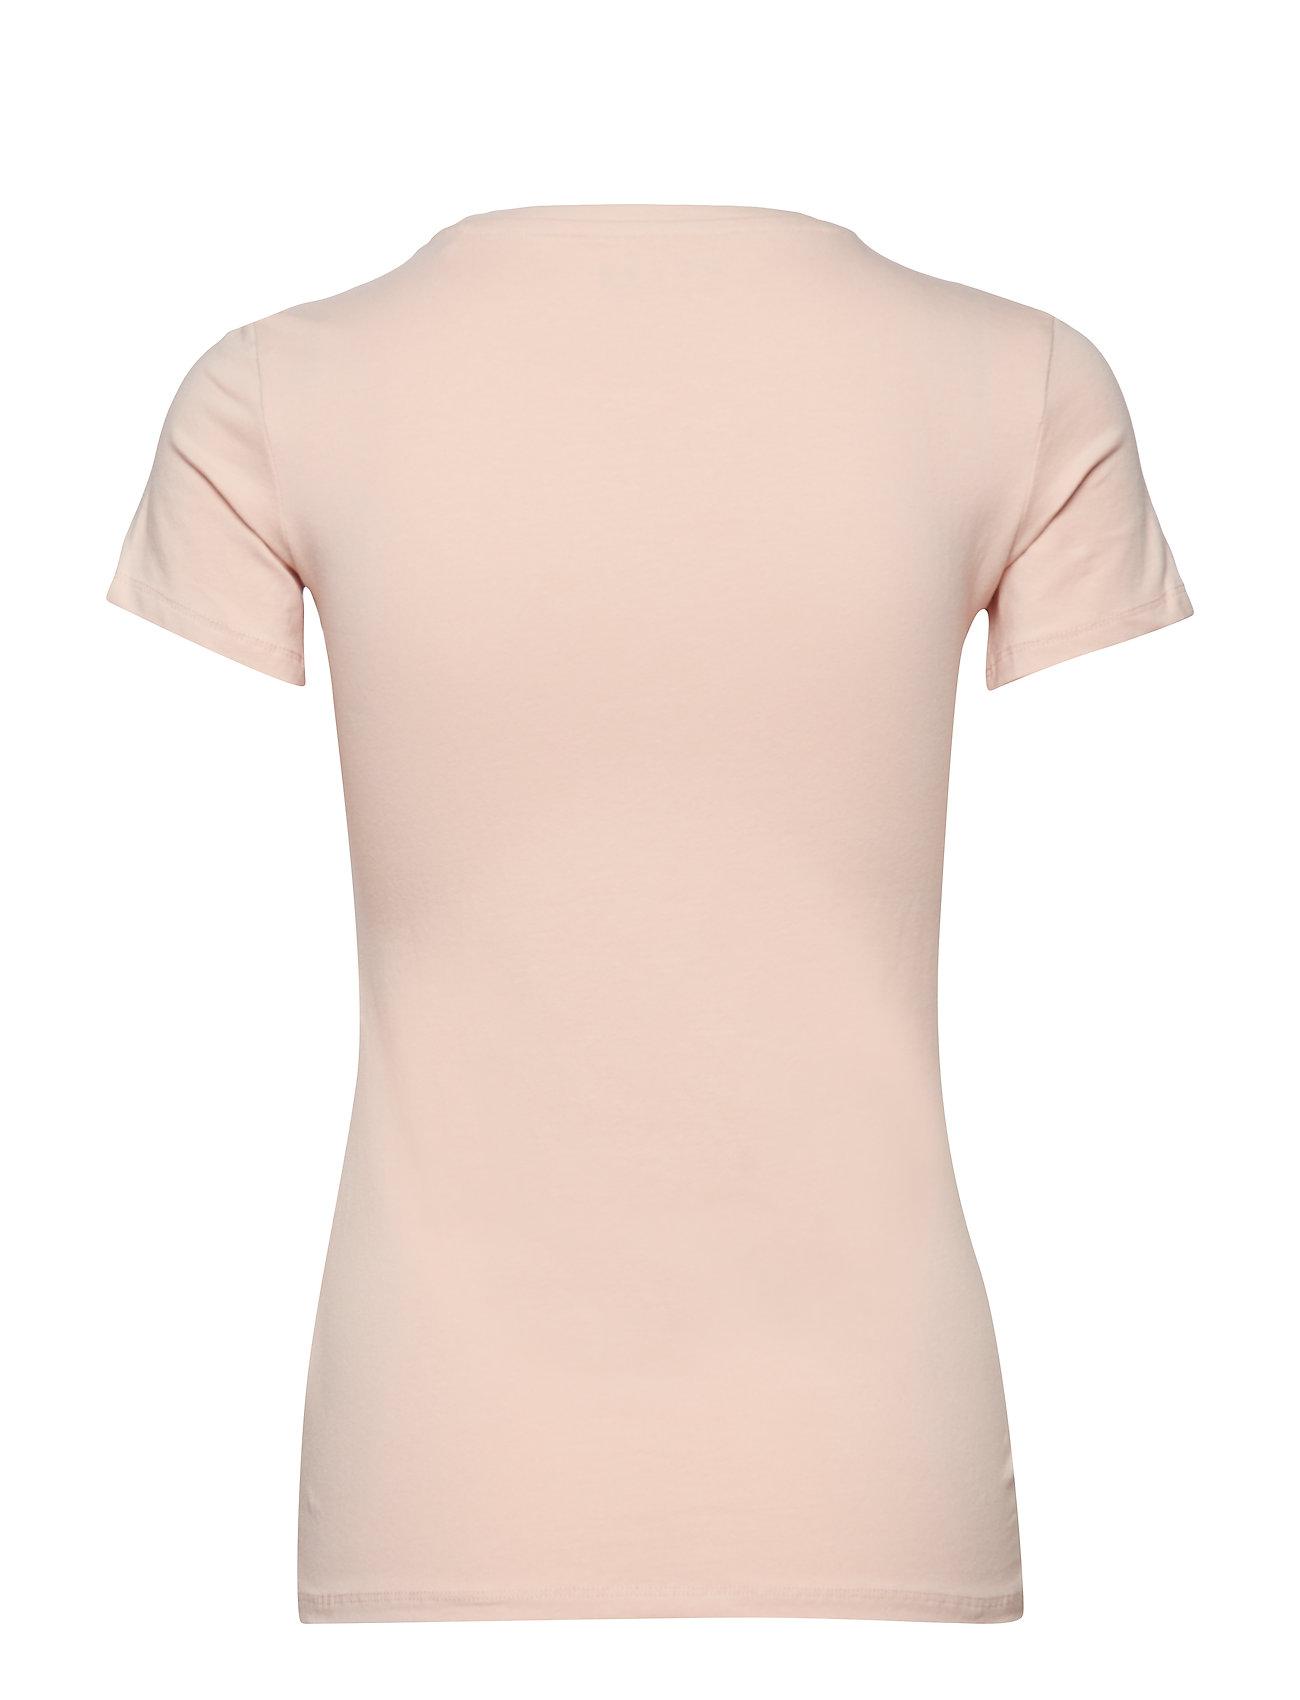 T shirtpale Logo SandGuess Cn Ss Jeans oBrCeWdx